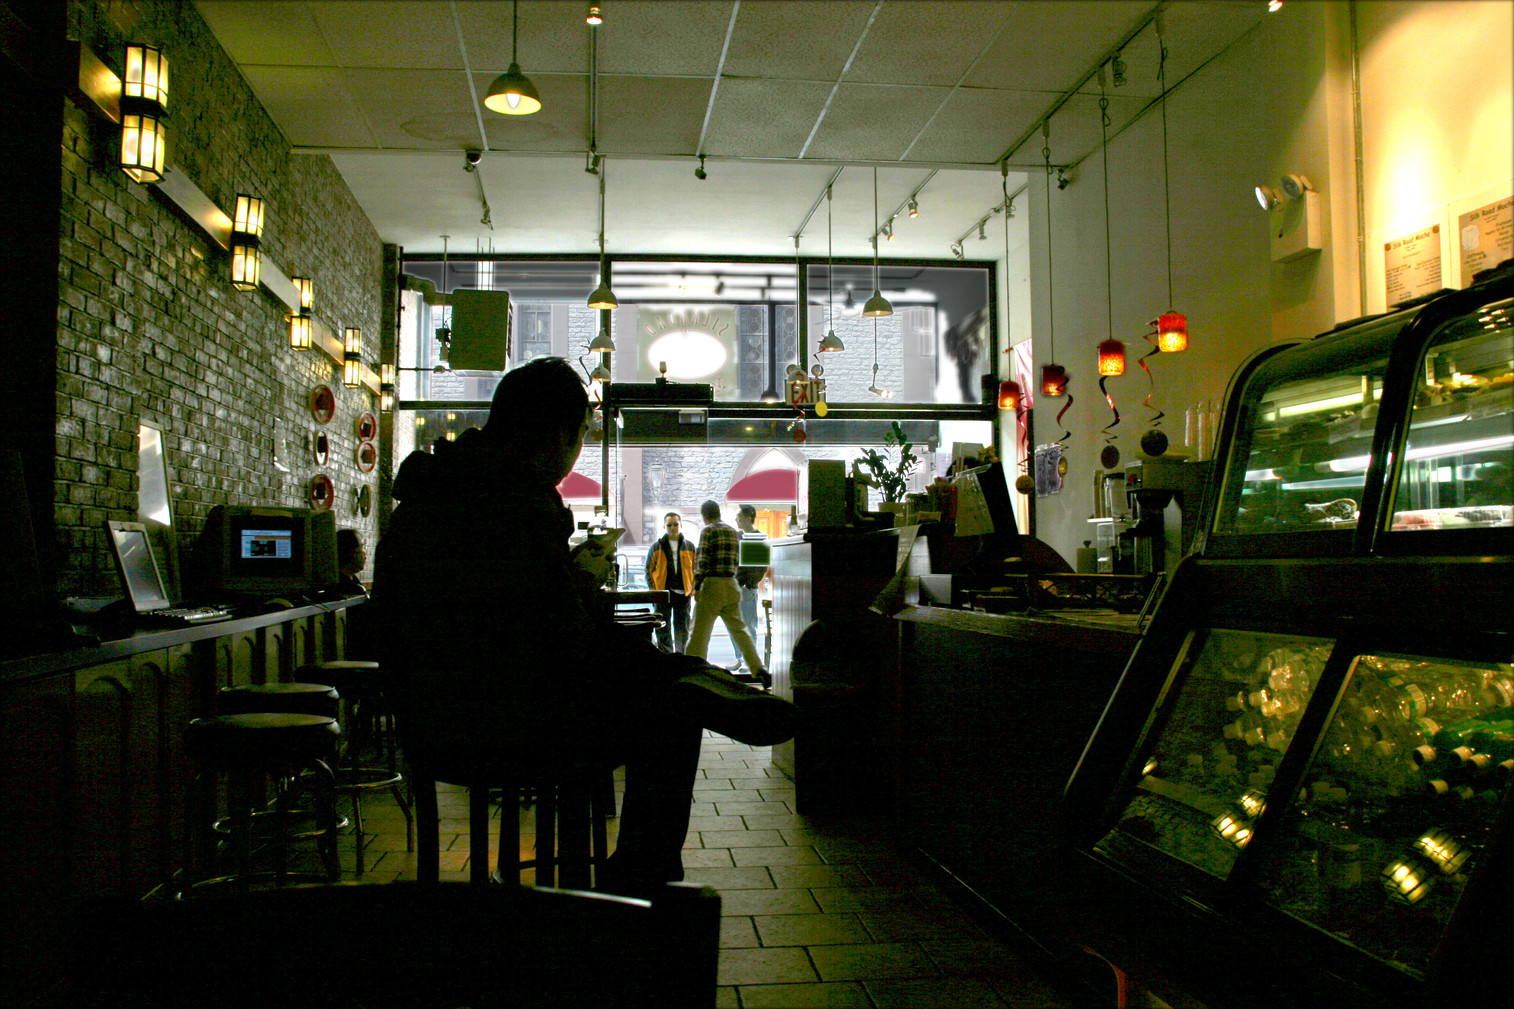 03_New York Polyphony, 2008, Fotografie,